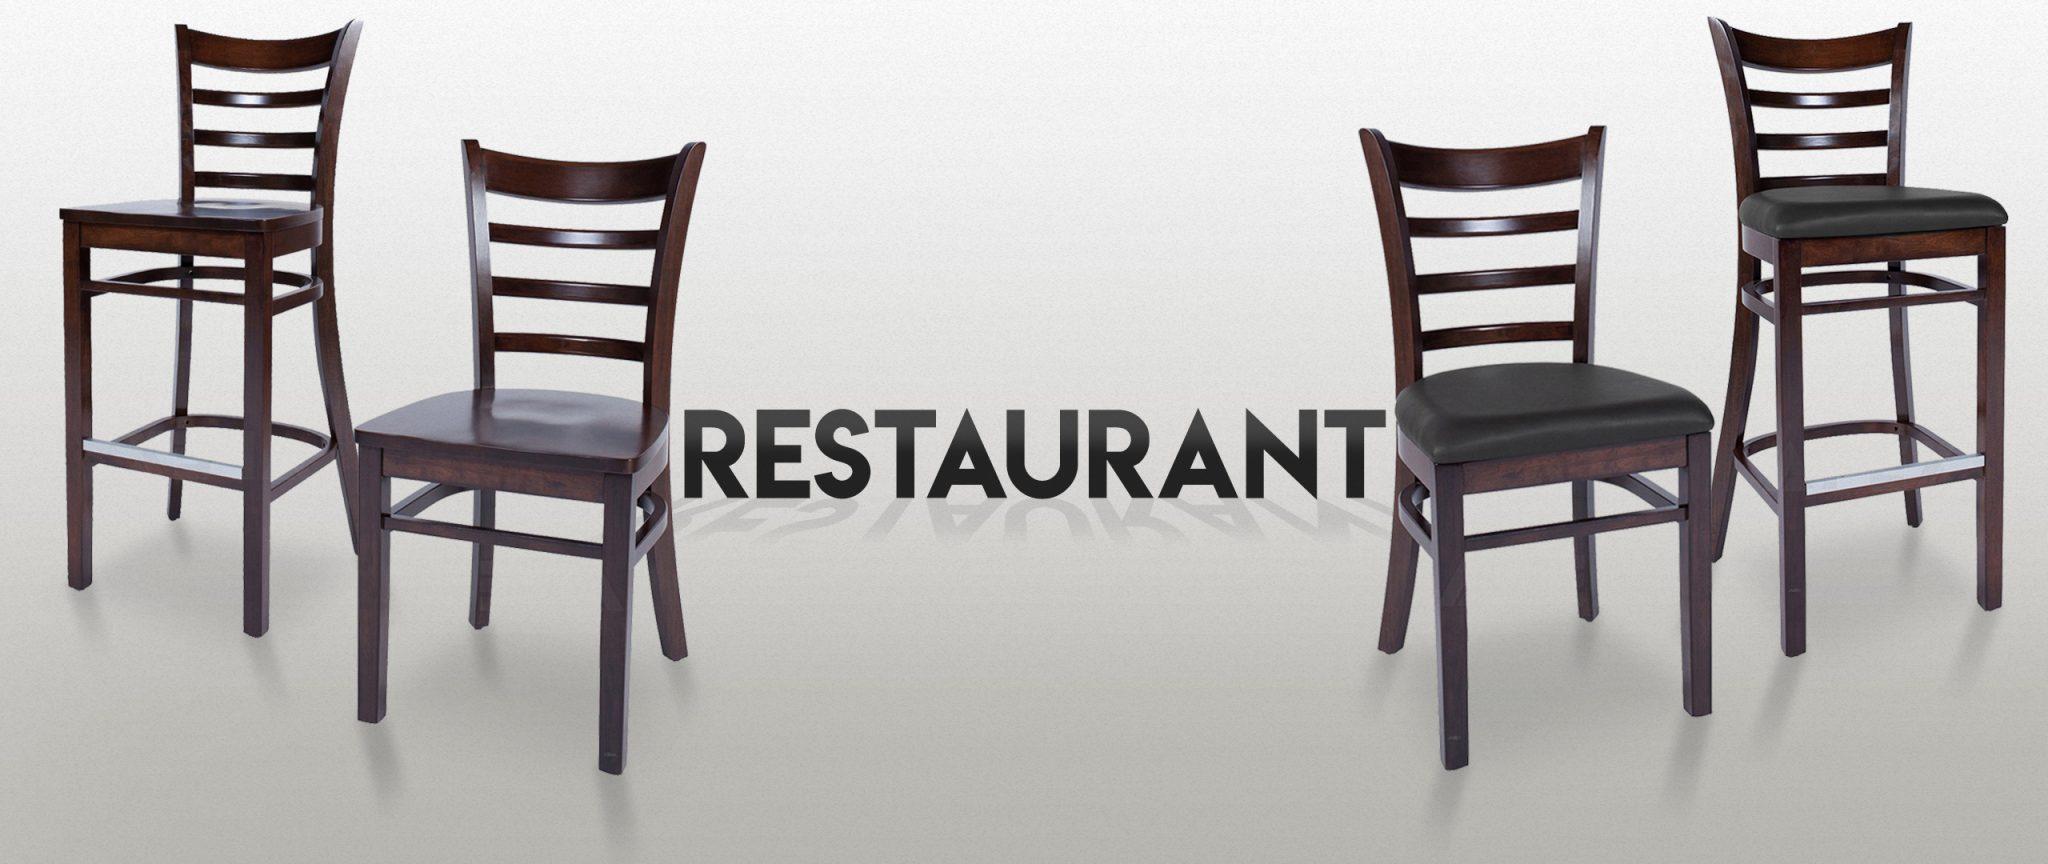 Apex Commercial Furniture